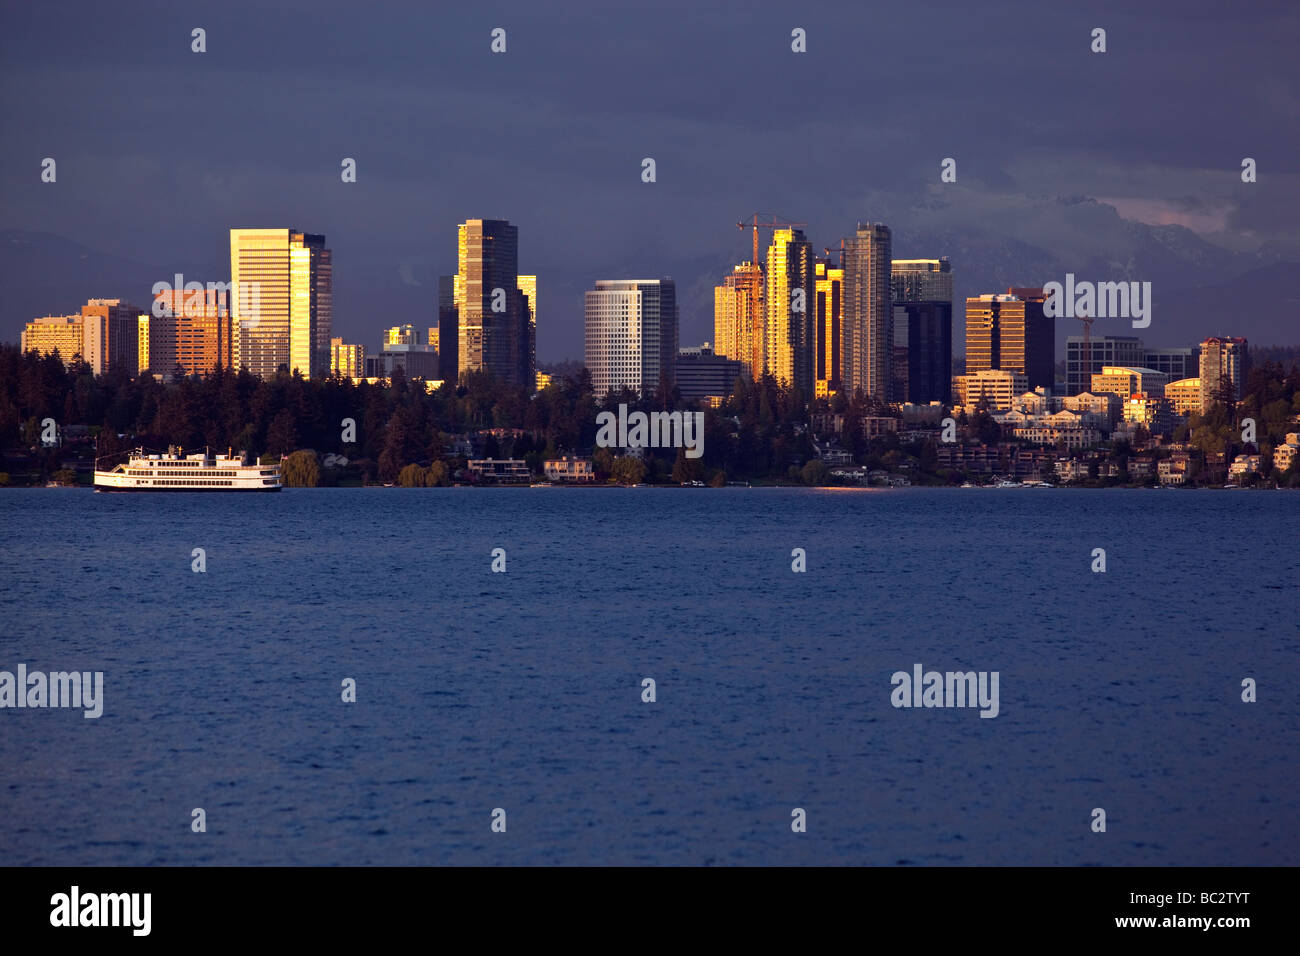 Bellevue Seattle Lake Washington Stockfotos & Bellevue Seattle Lake ...